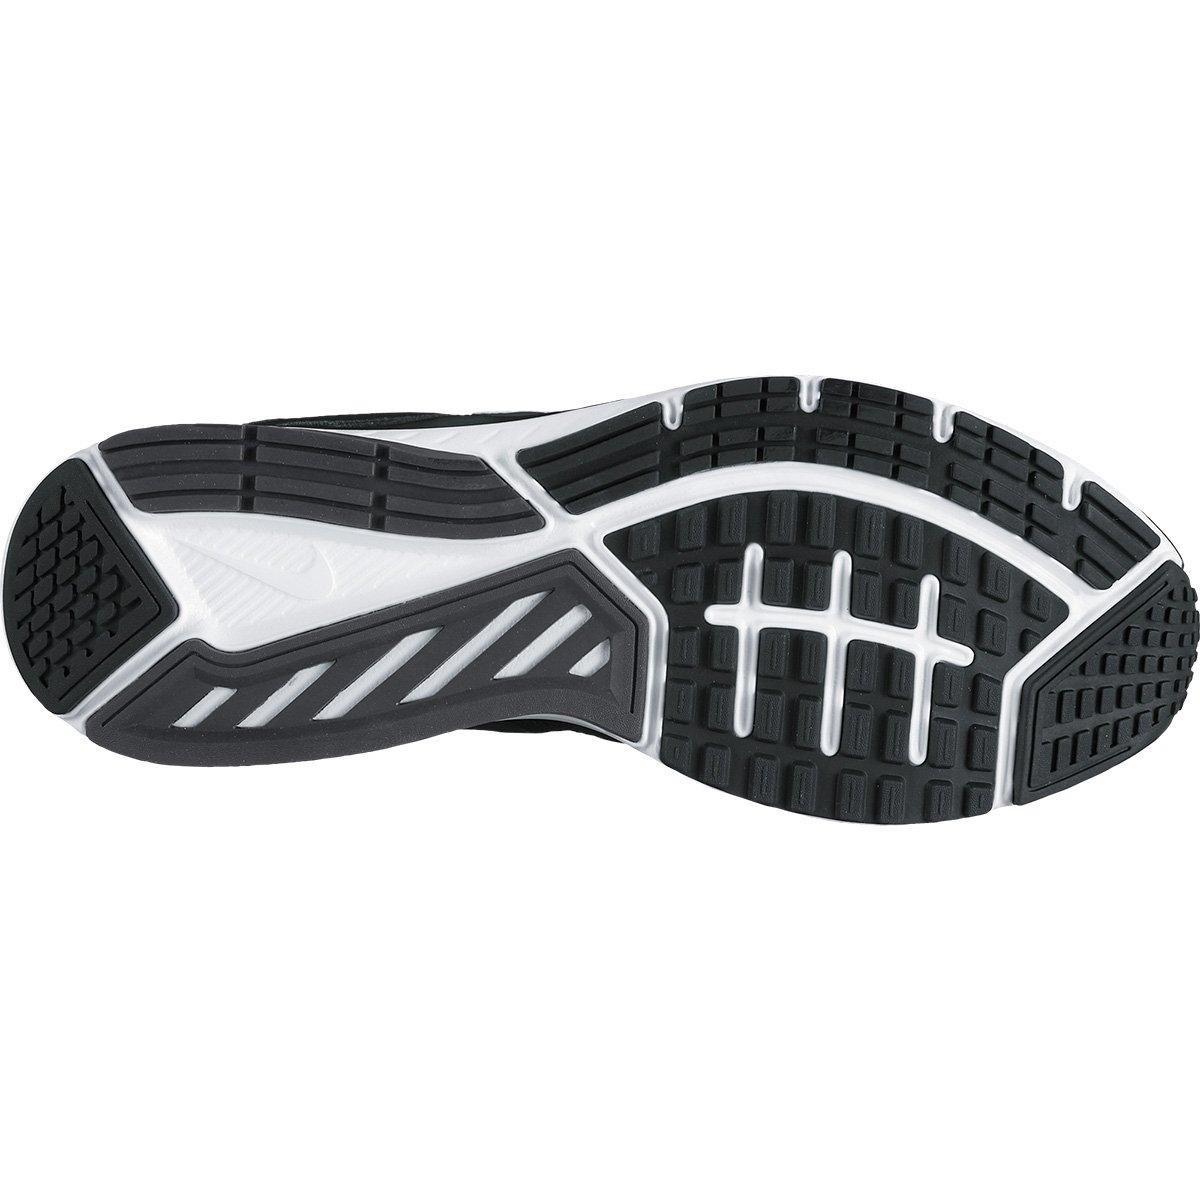 Tênis Nike Dart 12 MSL Masculino - Preto e Branco - Compre Agora ... e73c5d057a5ad